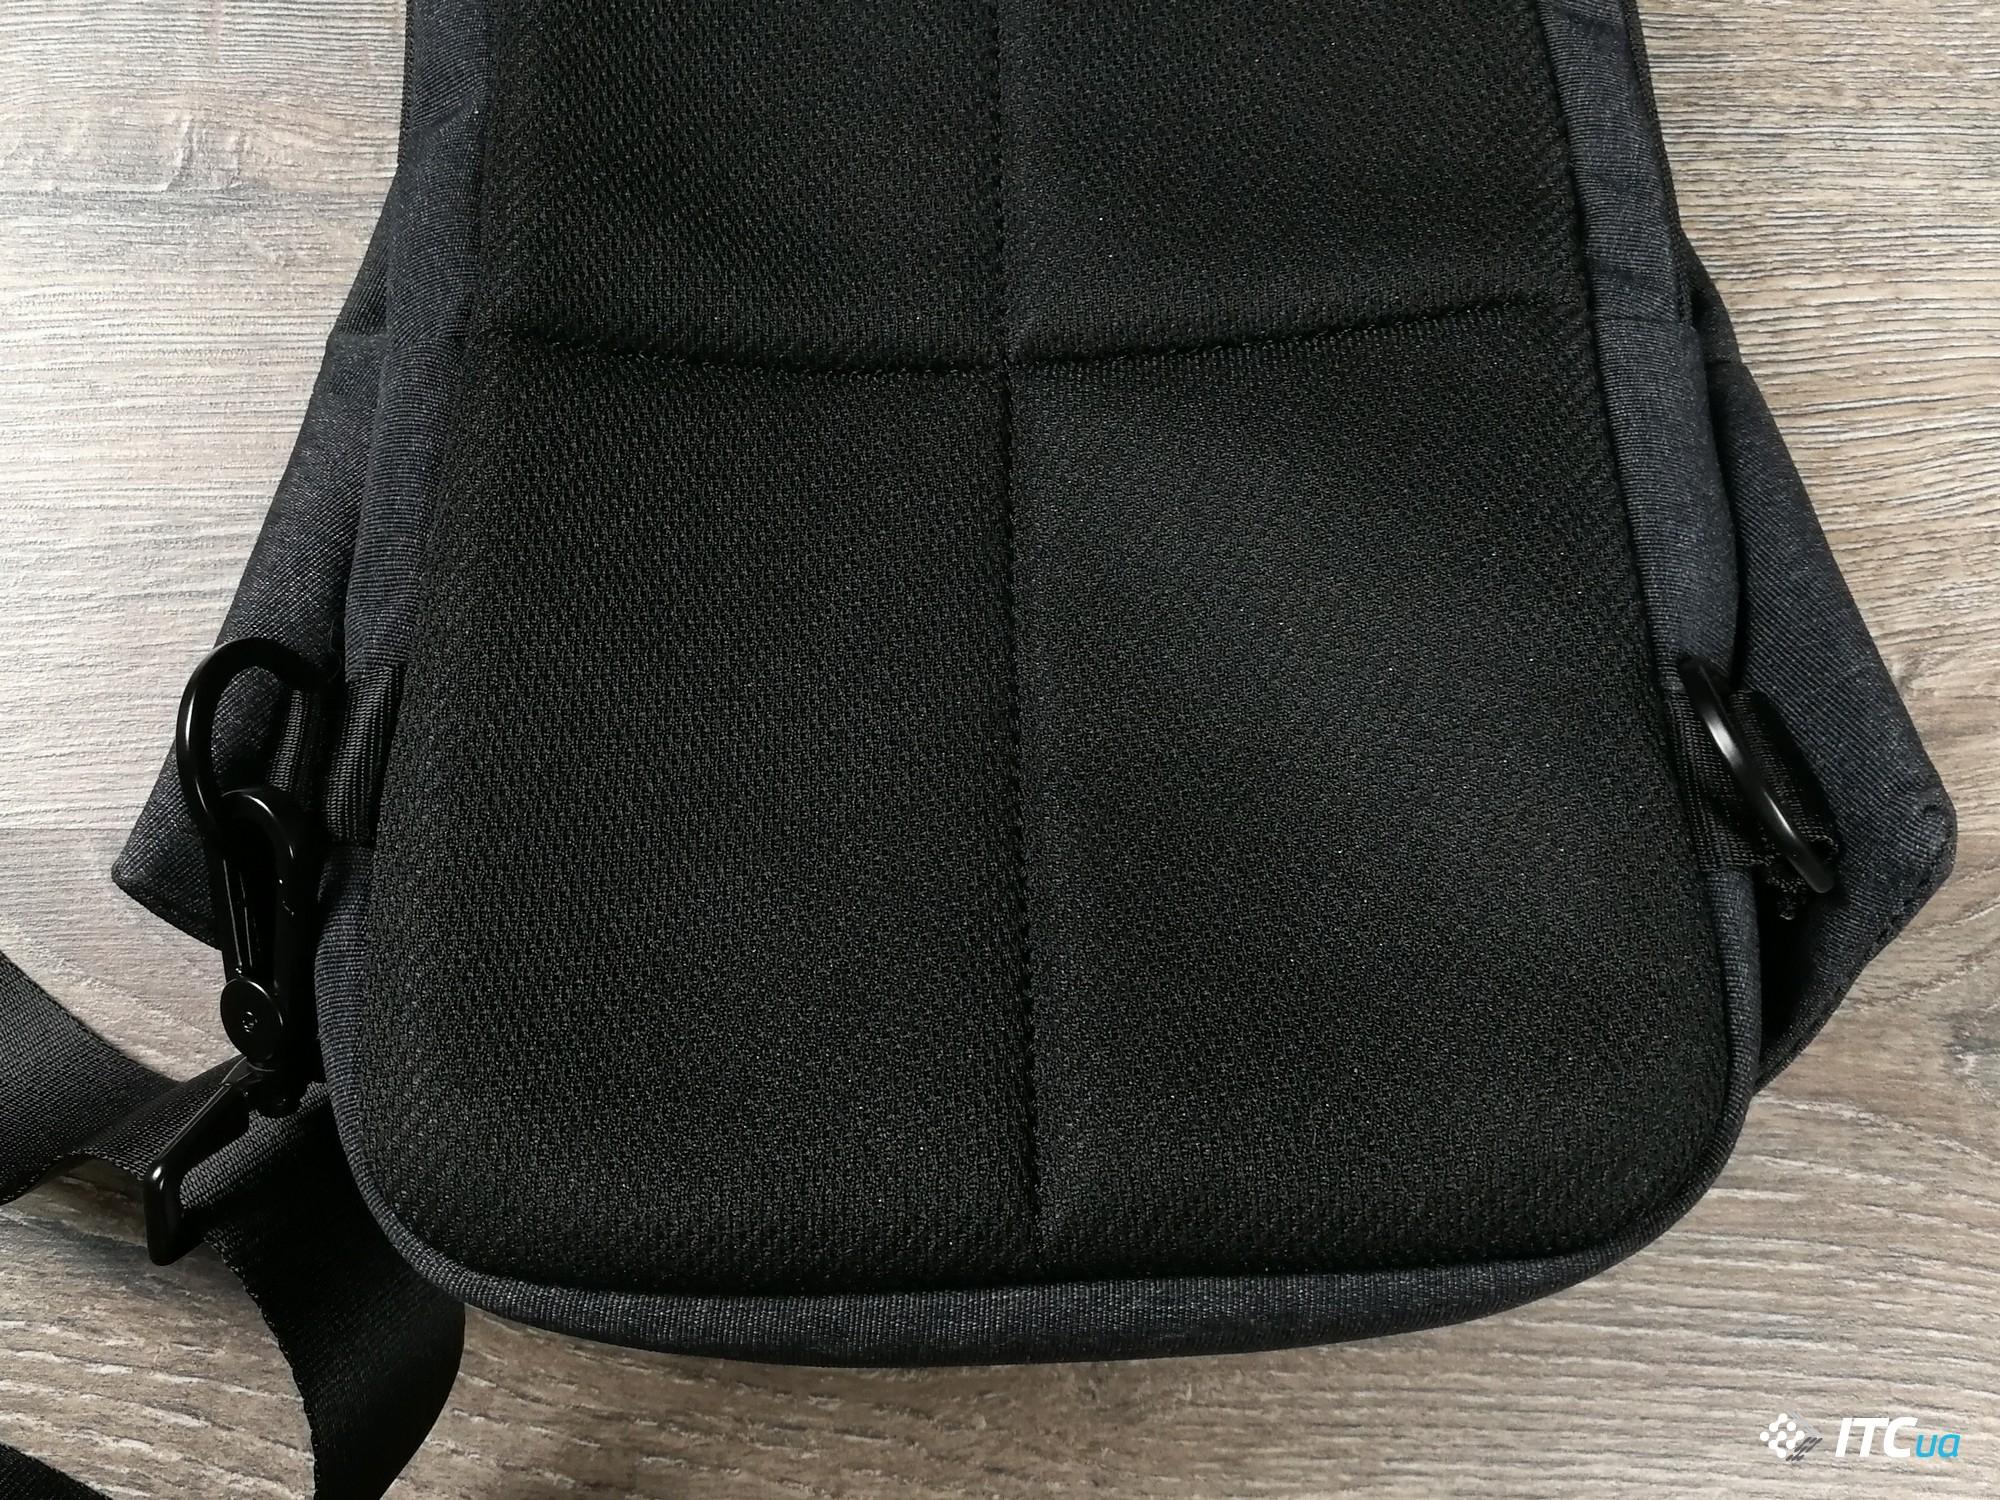 Все от Xiaomi: обзор рюкзака Mi minimalist urban и сумки Mi multi-functional urban